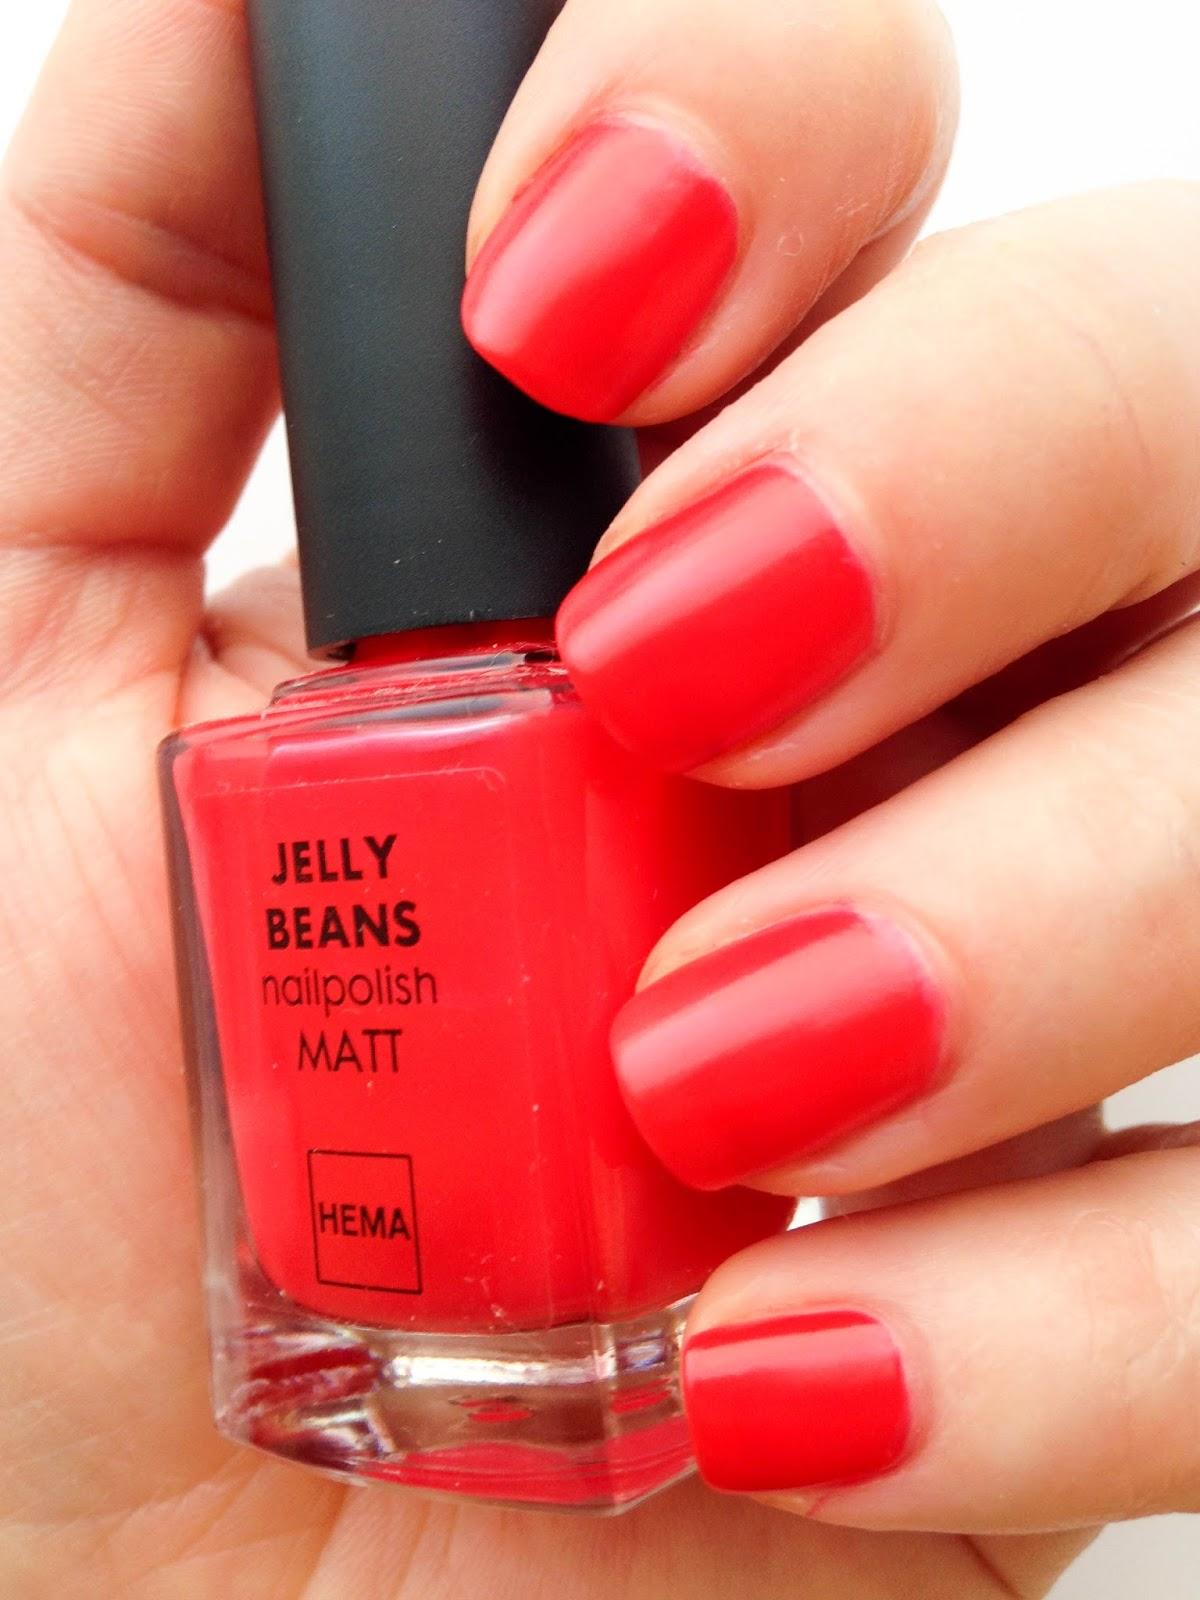 NOTD: HEMA Jelly Beans matt nail polish in Coral | Wrinkles And Heels